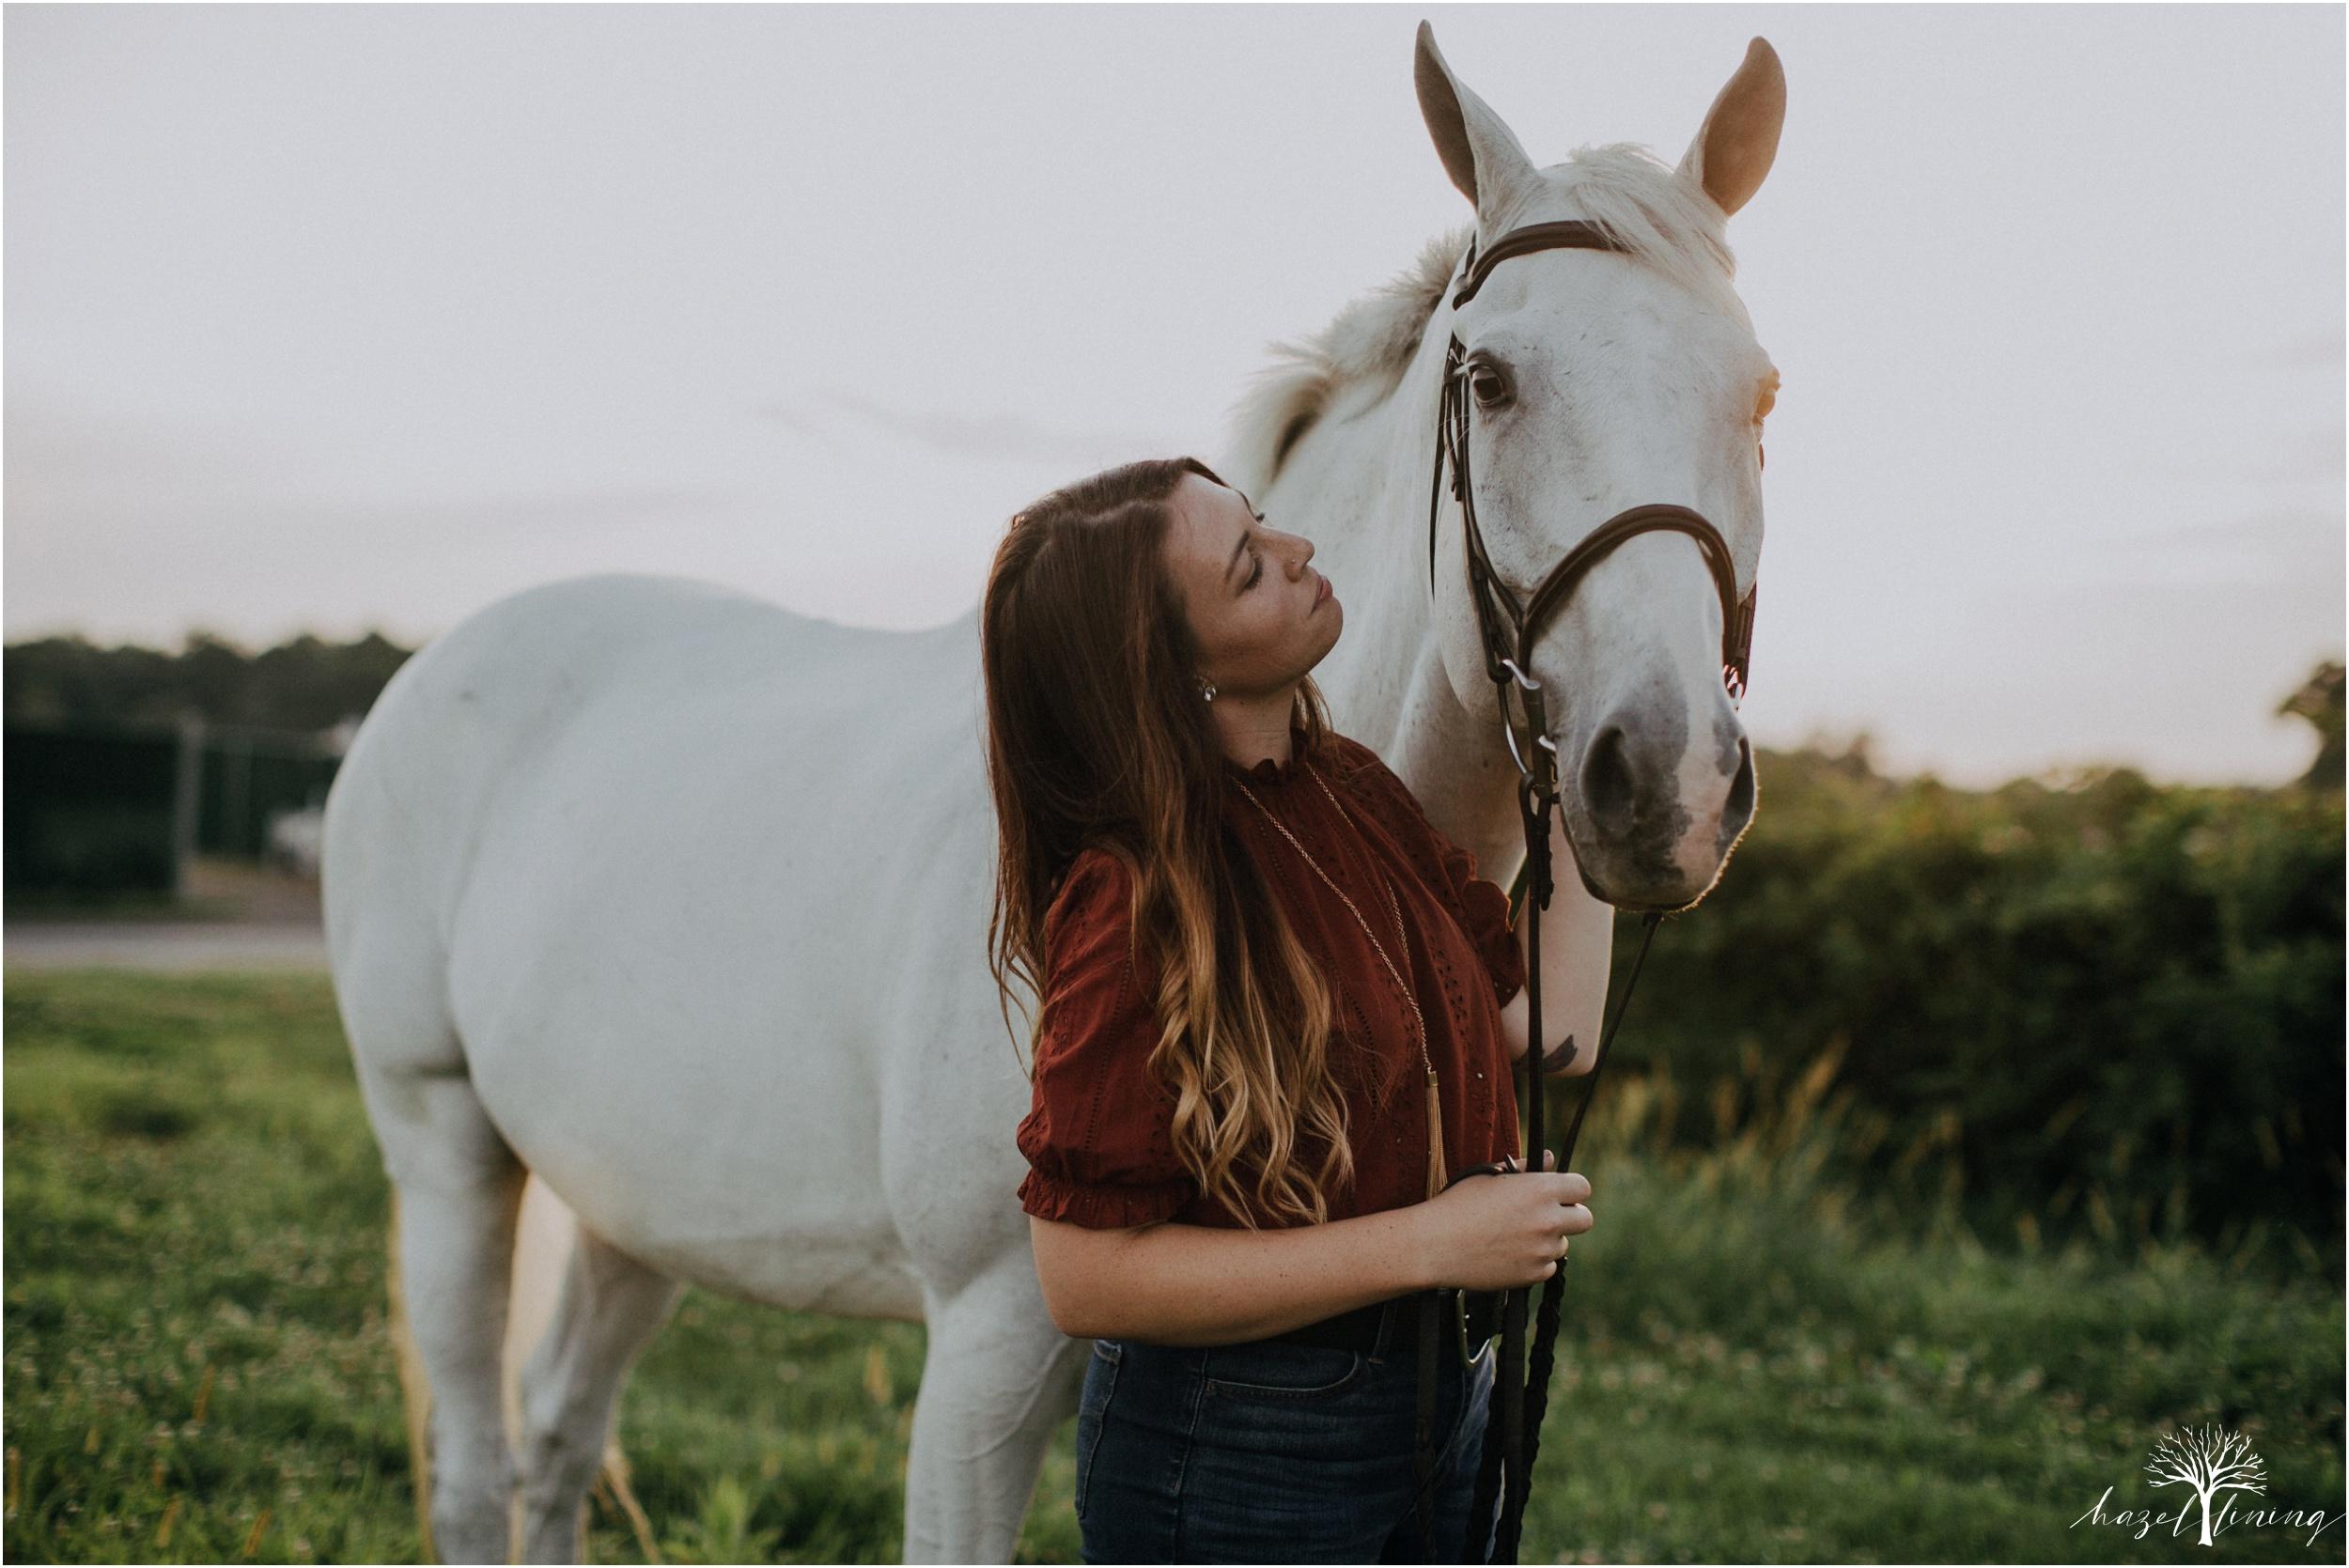 taylor-adams-and-horse-delaware-valley-university-delval-summer-equestrian-portrait-session-hazel-lining-photography-destination-elopement-wedding-engagement-photography_0031.jpg